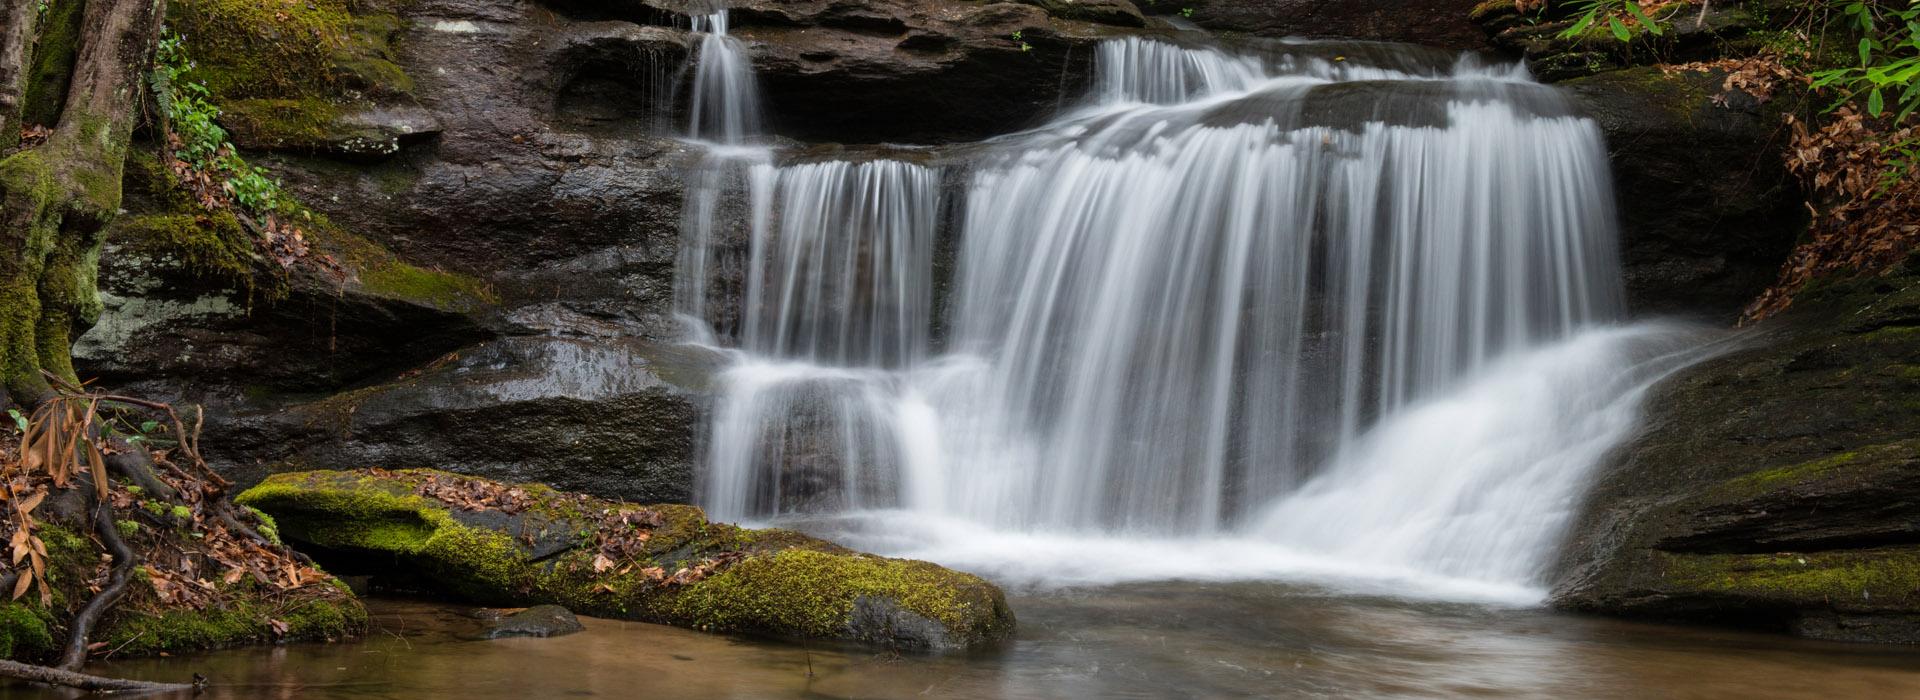 01-Asheville-Photography-Waterfall